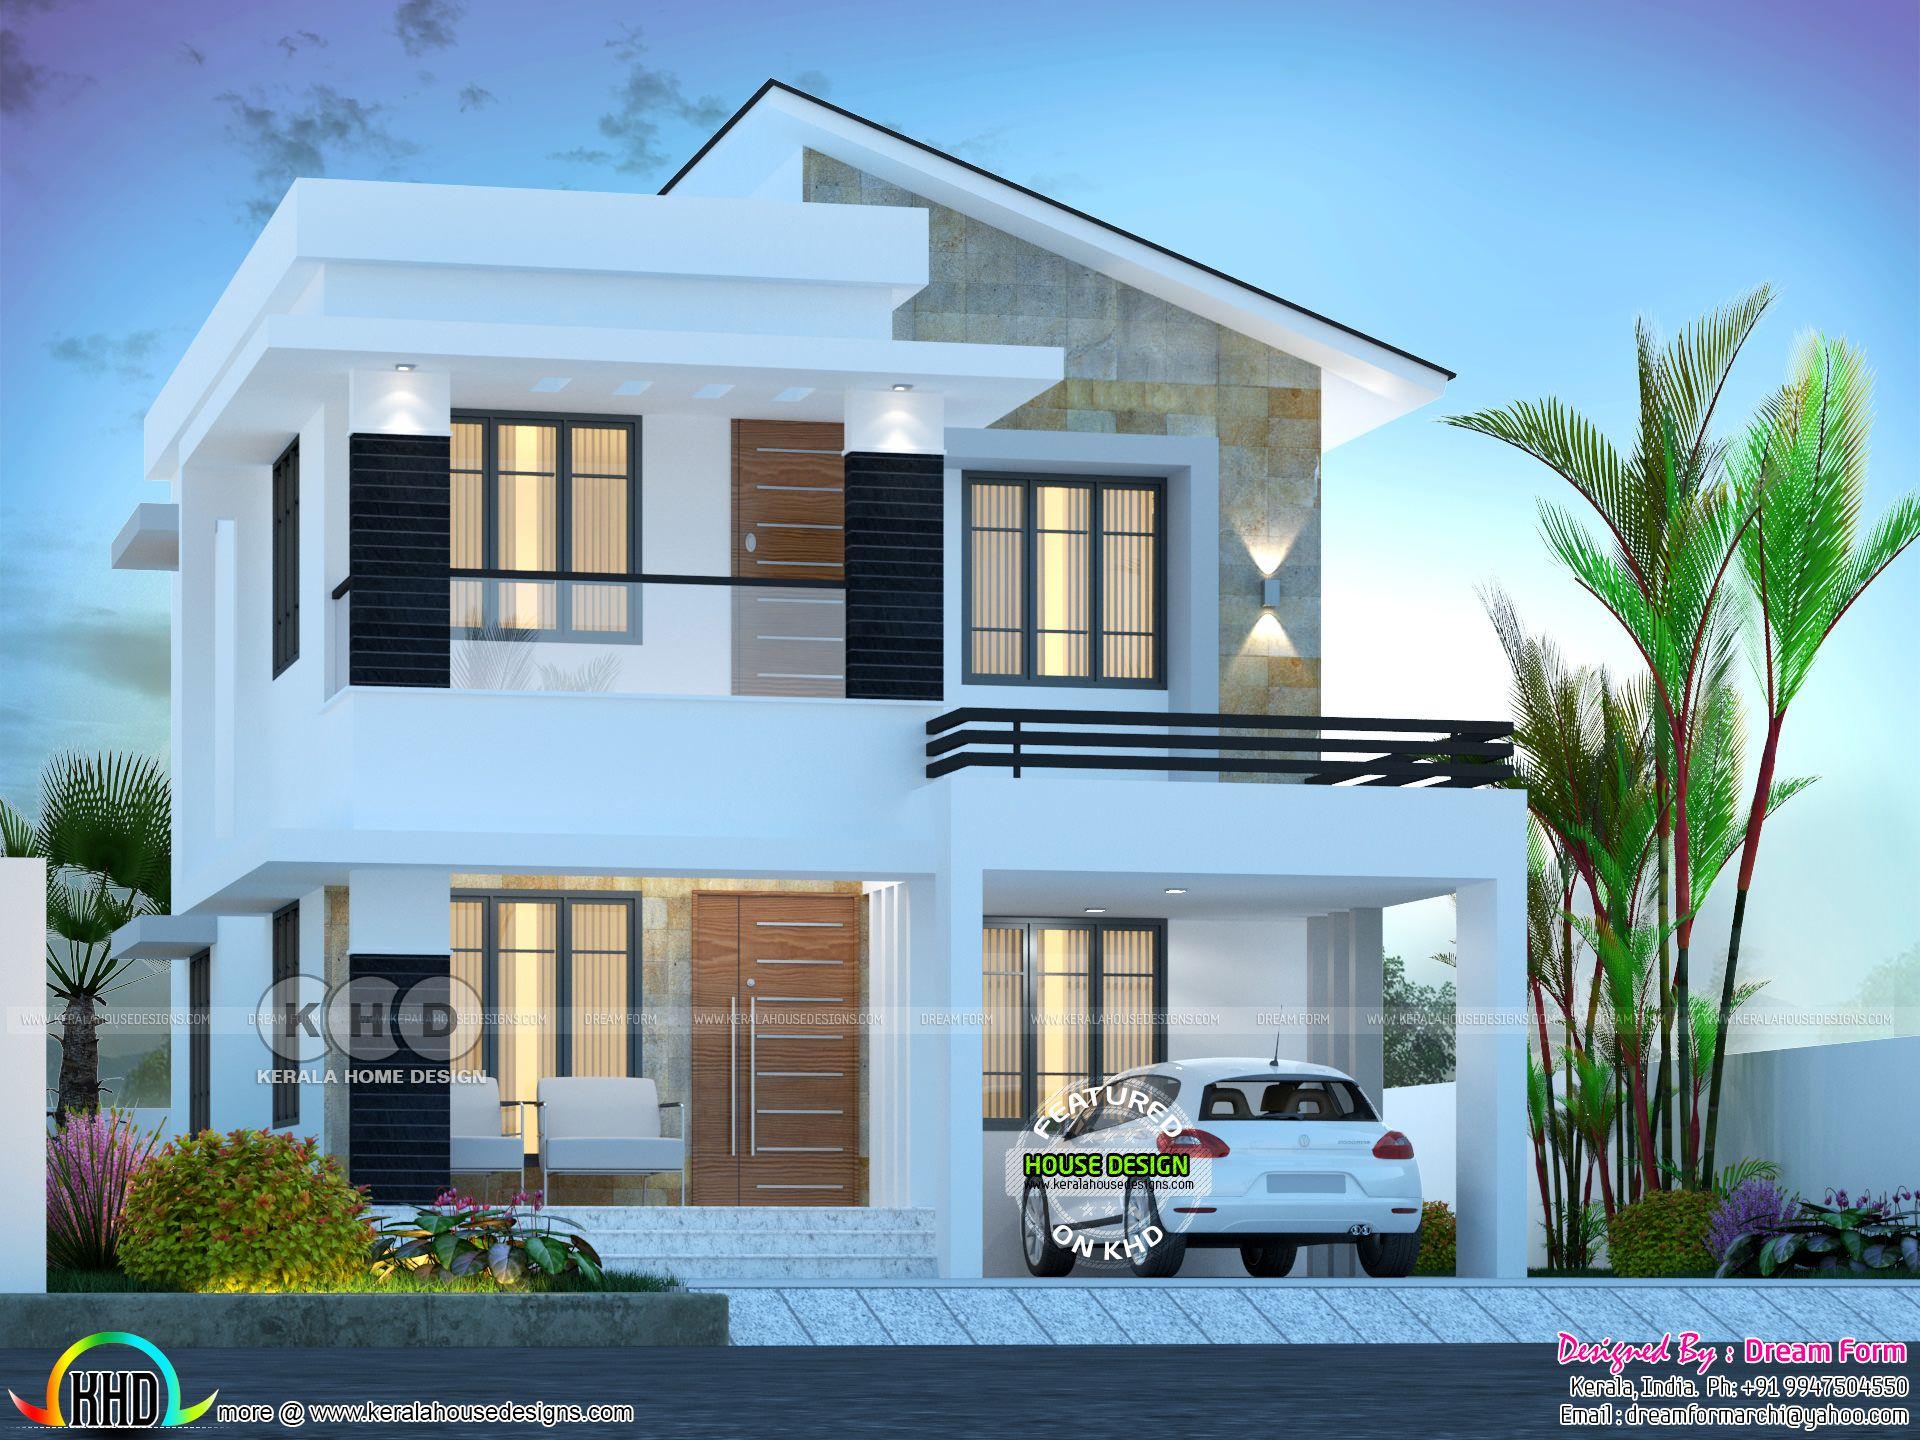 3 Bedroom 1750 Sq Ft Beautiful Modern Home Design Duplex House Design 2 Storey House Design Bungalow House Design